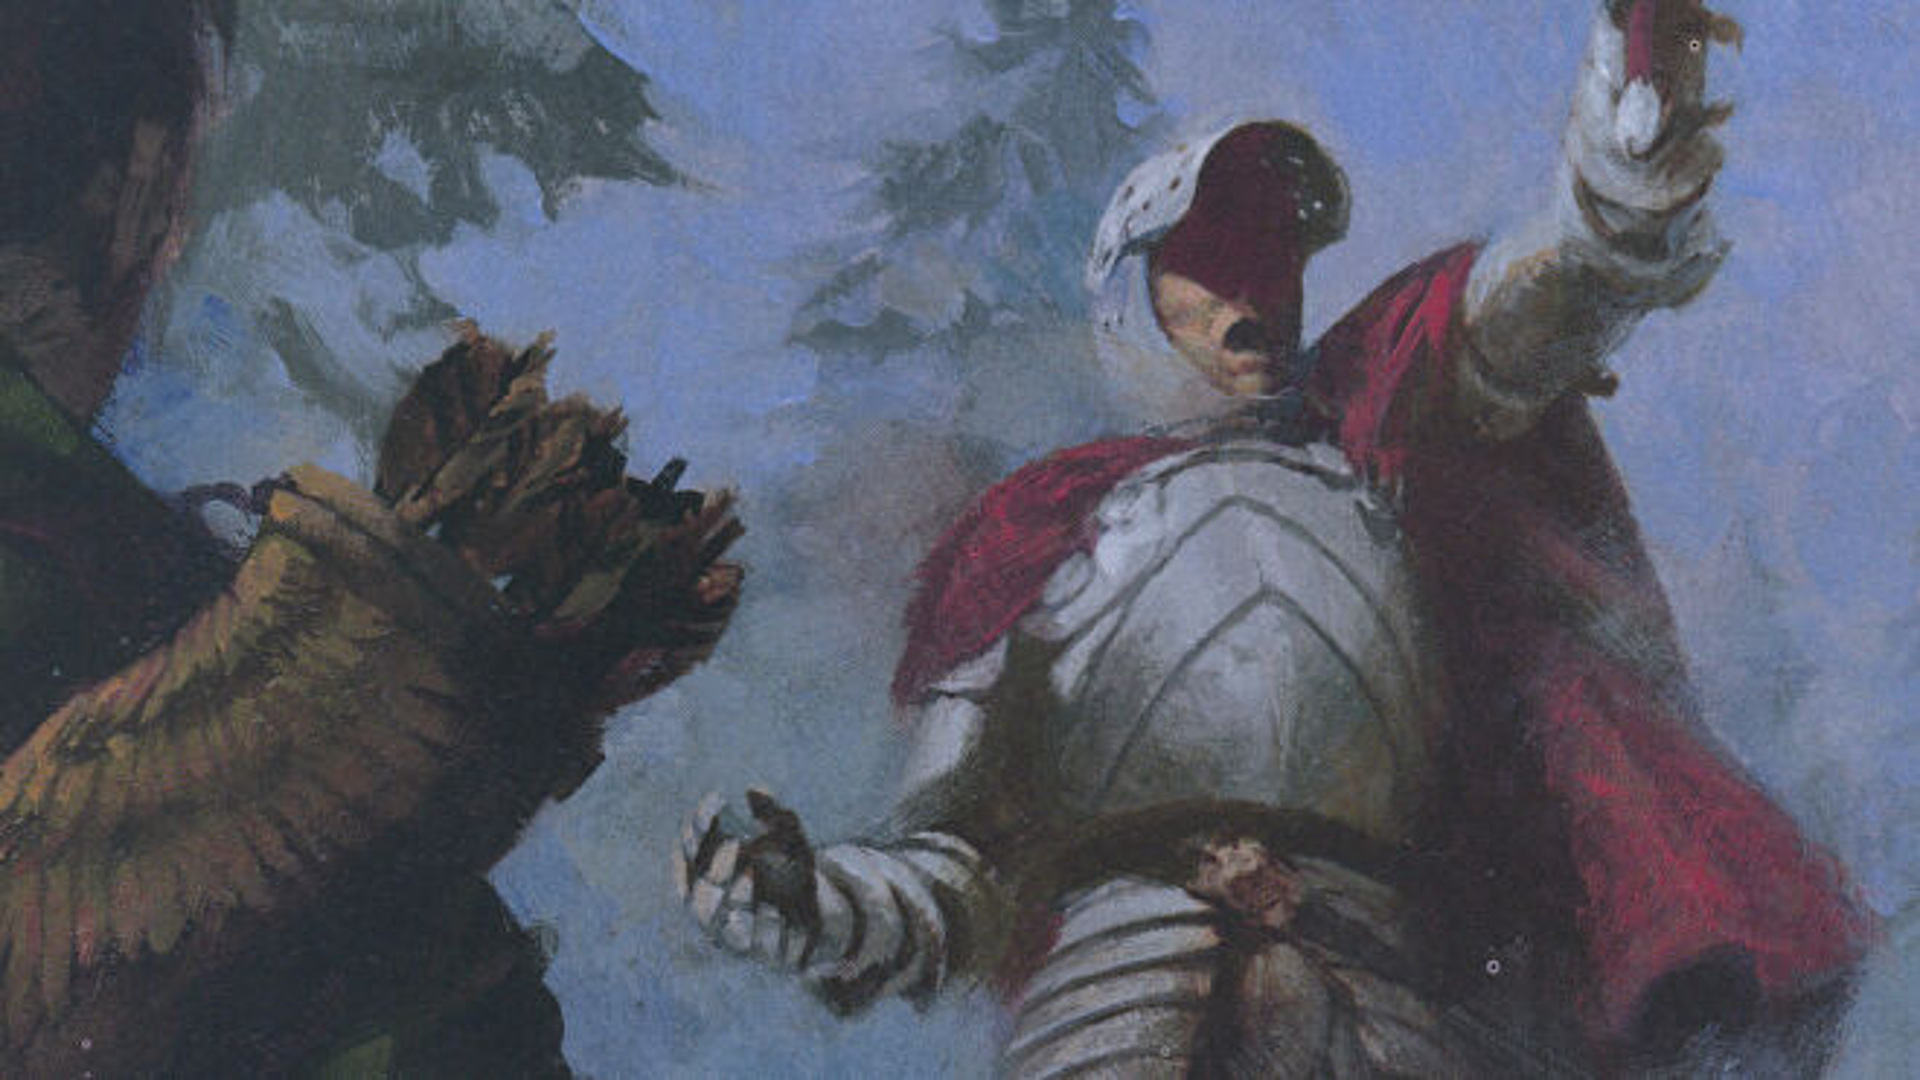 Dungeons & Dragons 5e Players Handbook artwork 6